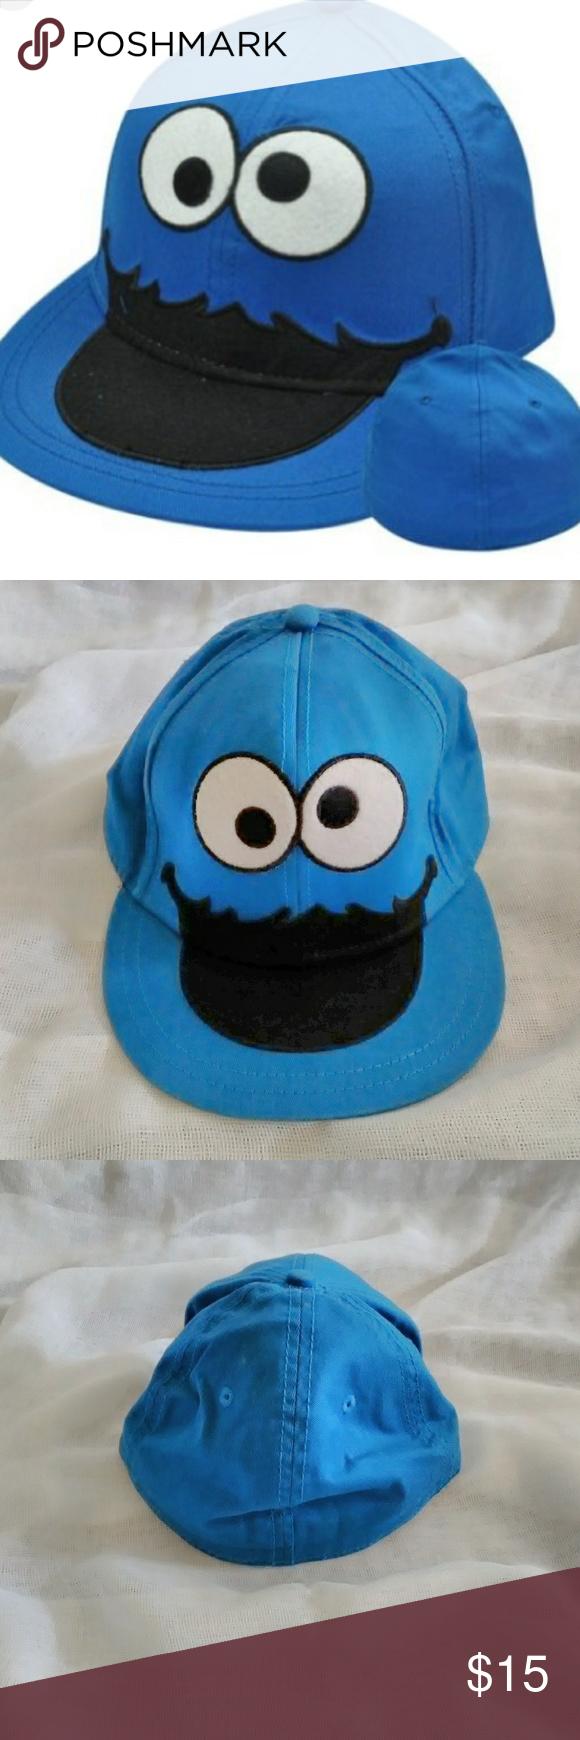 31623768240cc Cookie Monster Flat bill hat EUC Cookie Monster flat bill hat. Size  Small Medium Sesame Street Accessories Hats